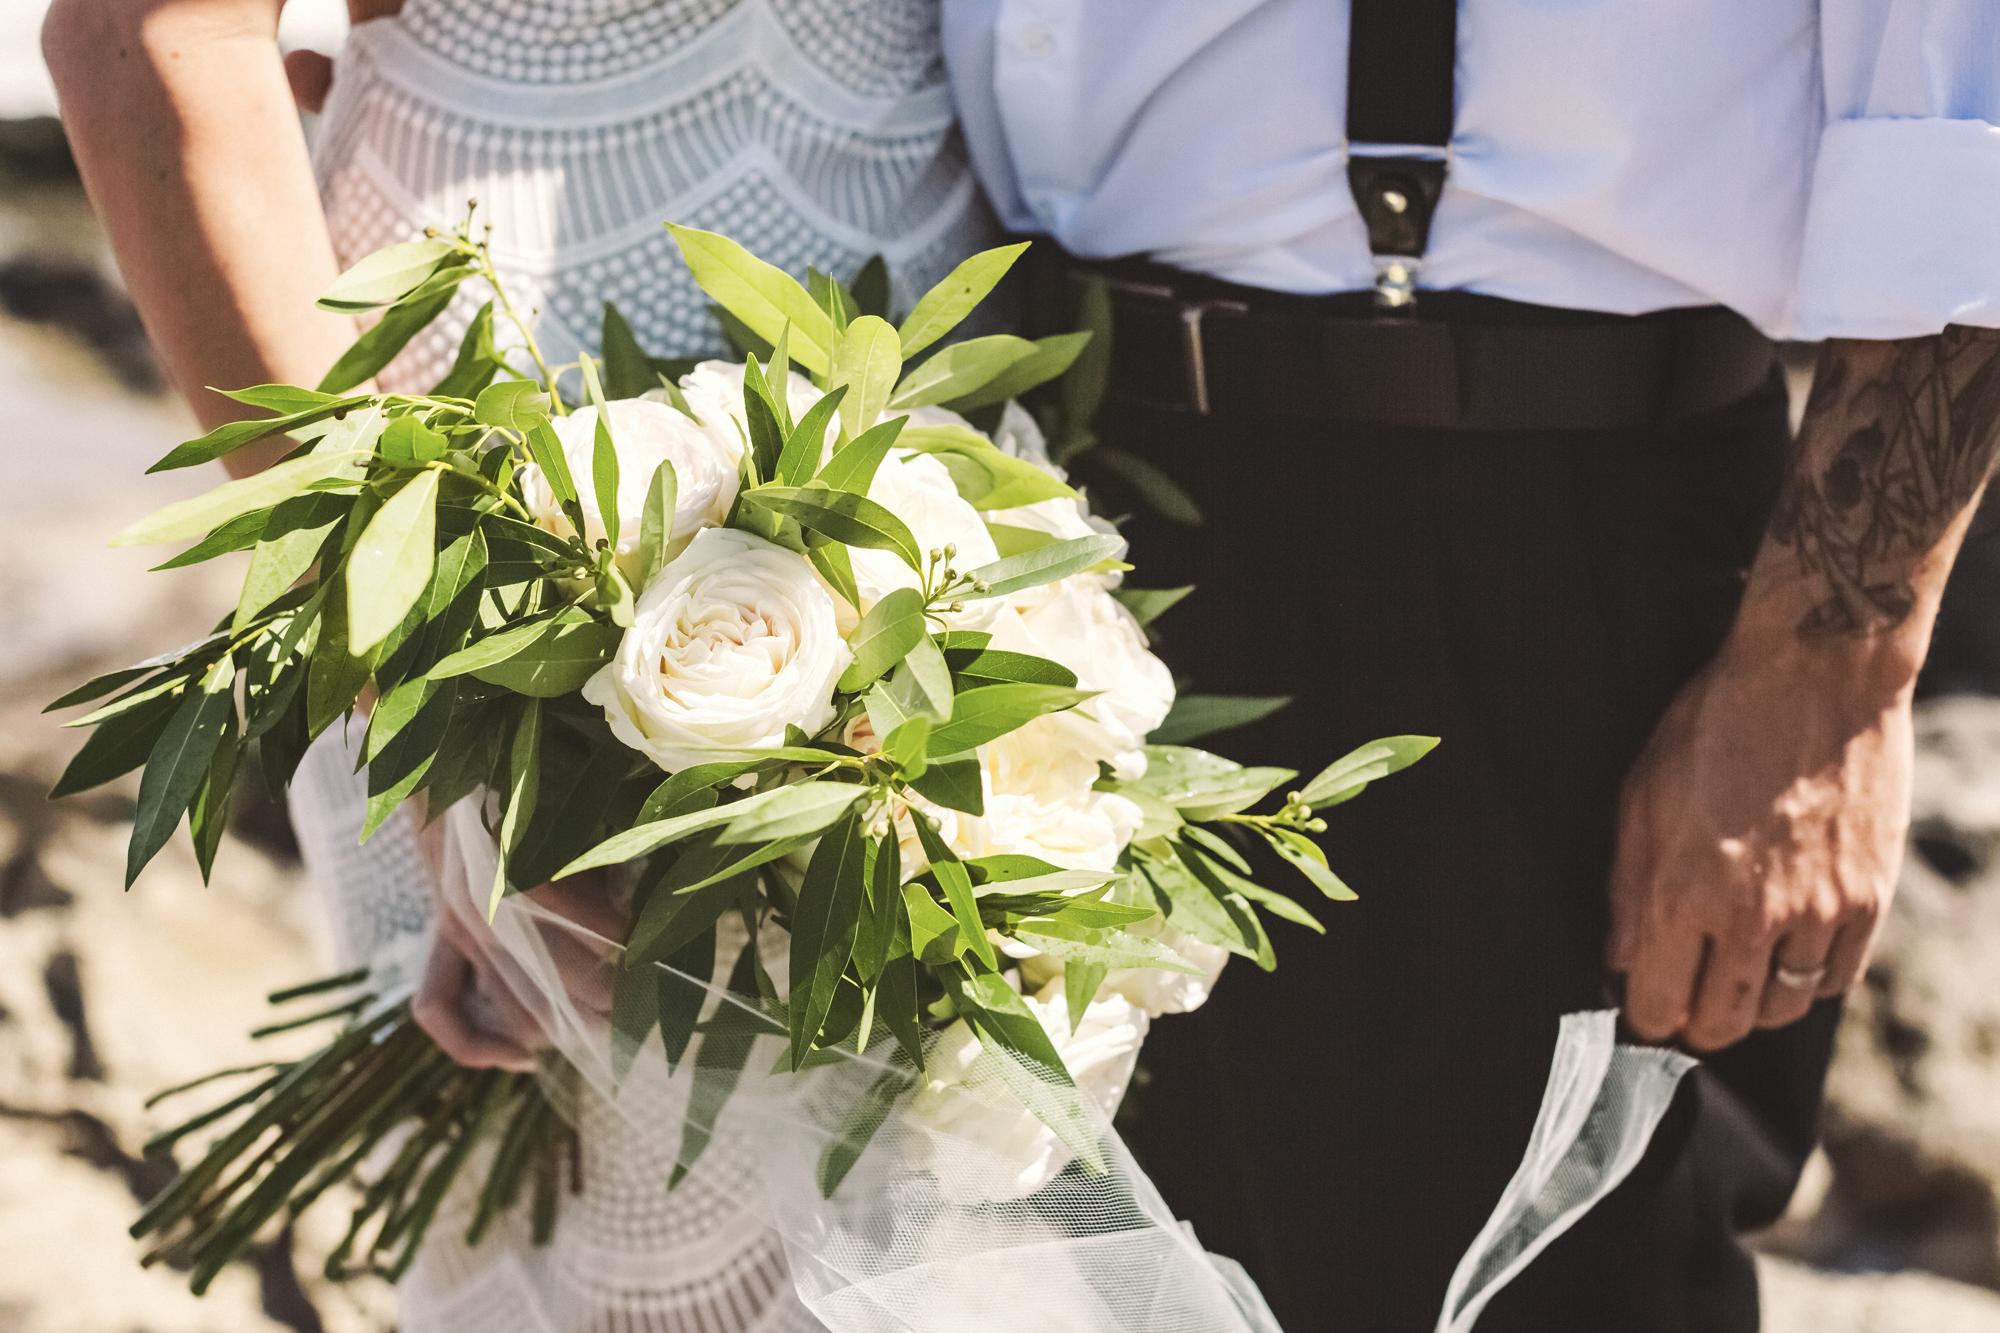 angie-diaz-photography-hawaii-wedding-32.jpg